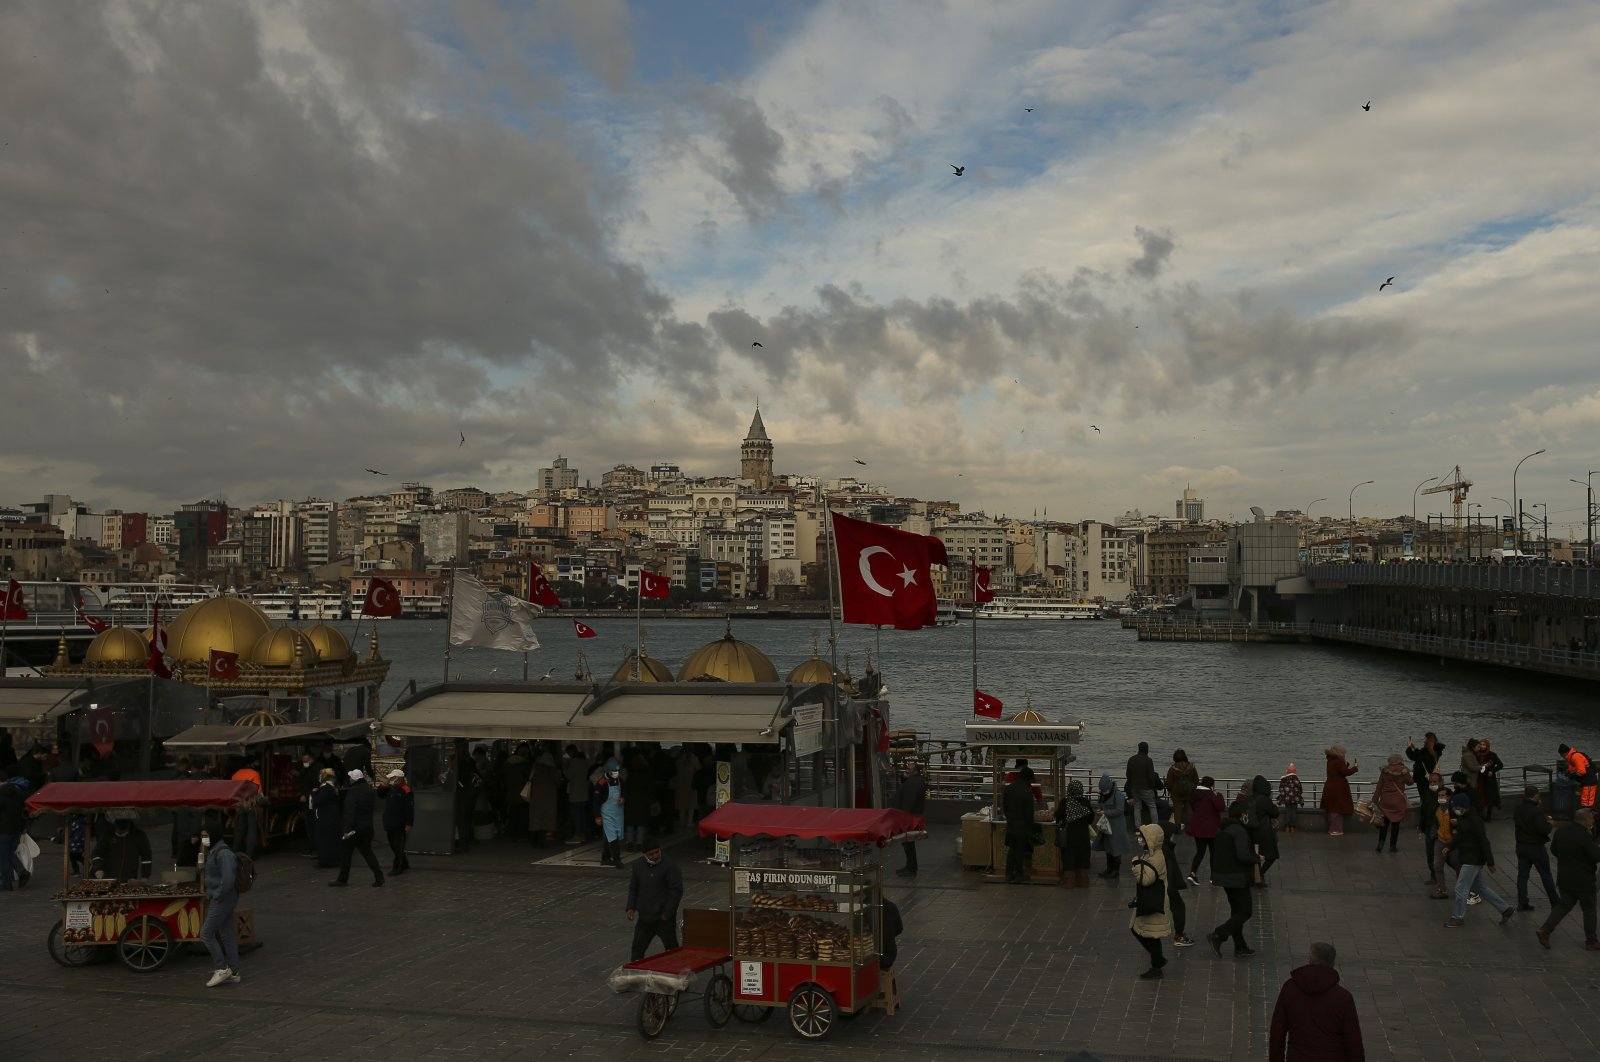 People wearing masks against the coronavirus walk around the Galata Bridge, Istanbul, Turkey, Jan. 29, 2021. (AP Photo)